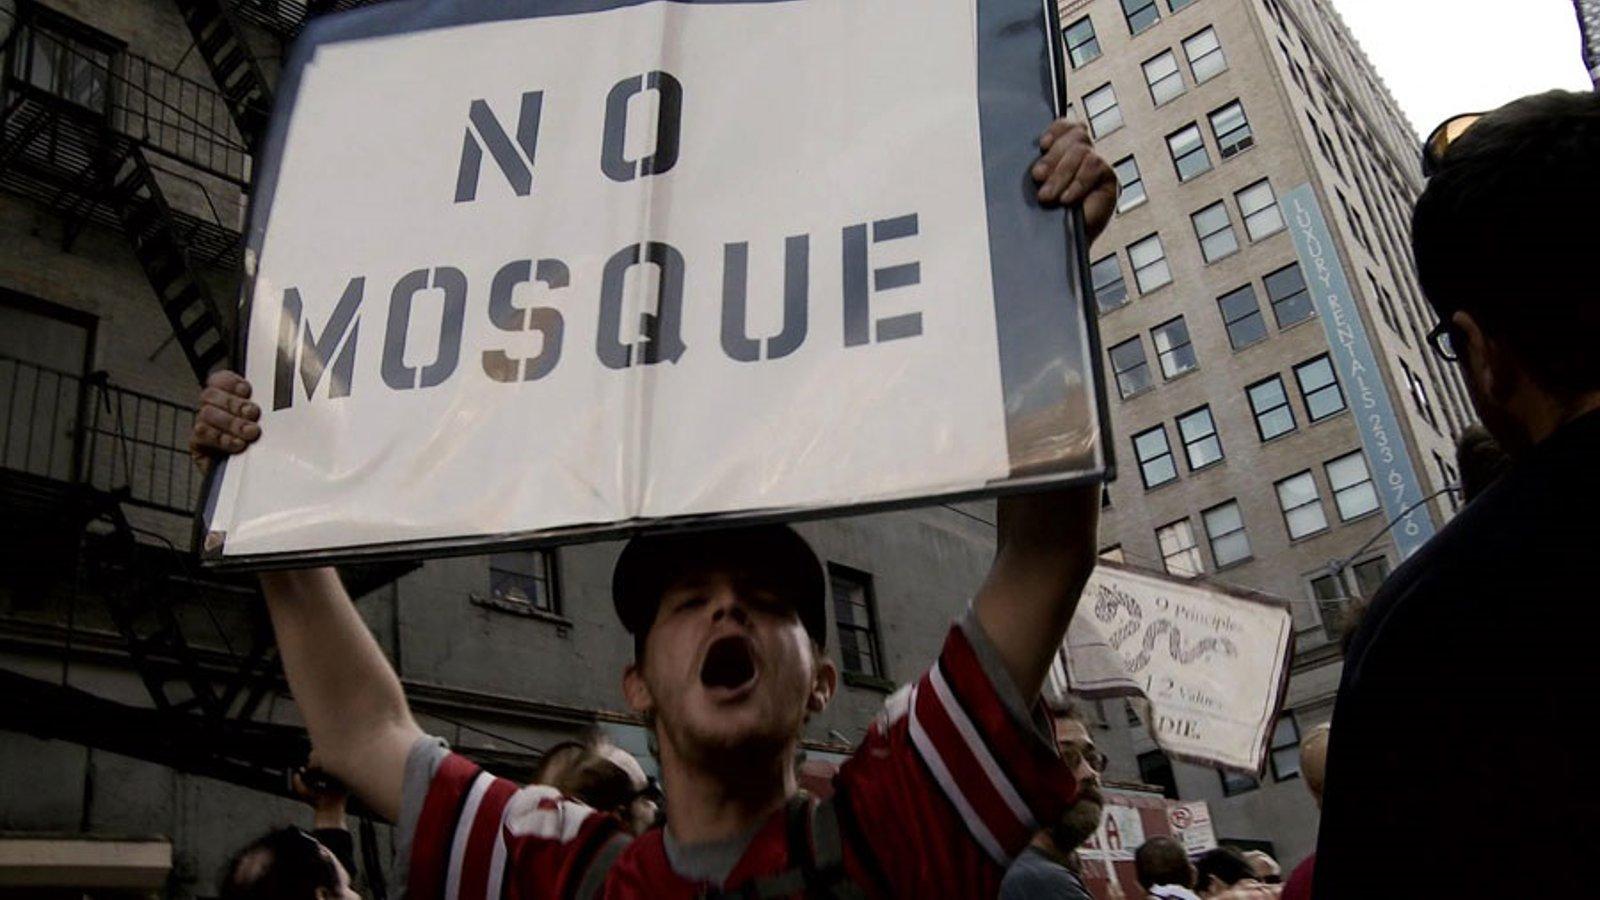 Building Babel - The Ground Zero Mosque